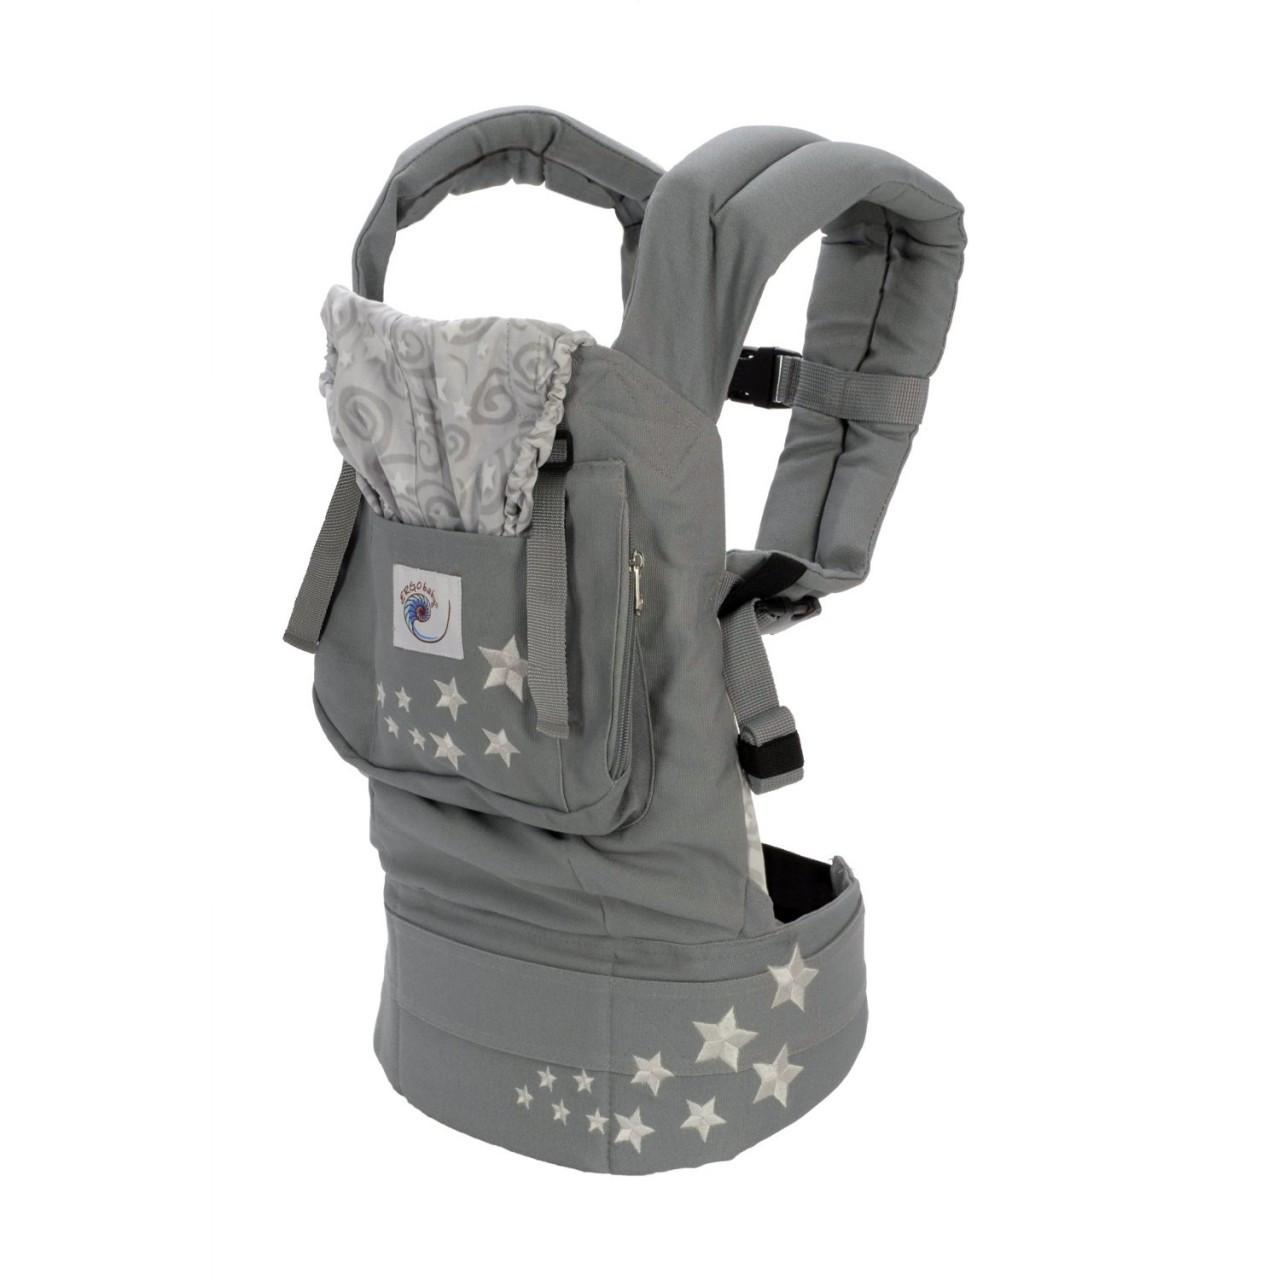 Ergobaby Original Baby Carrier Gray